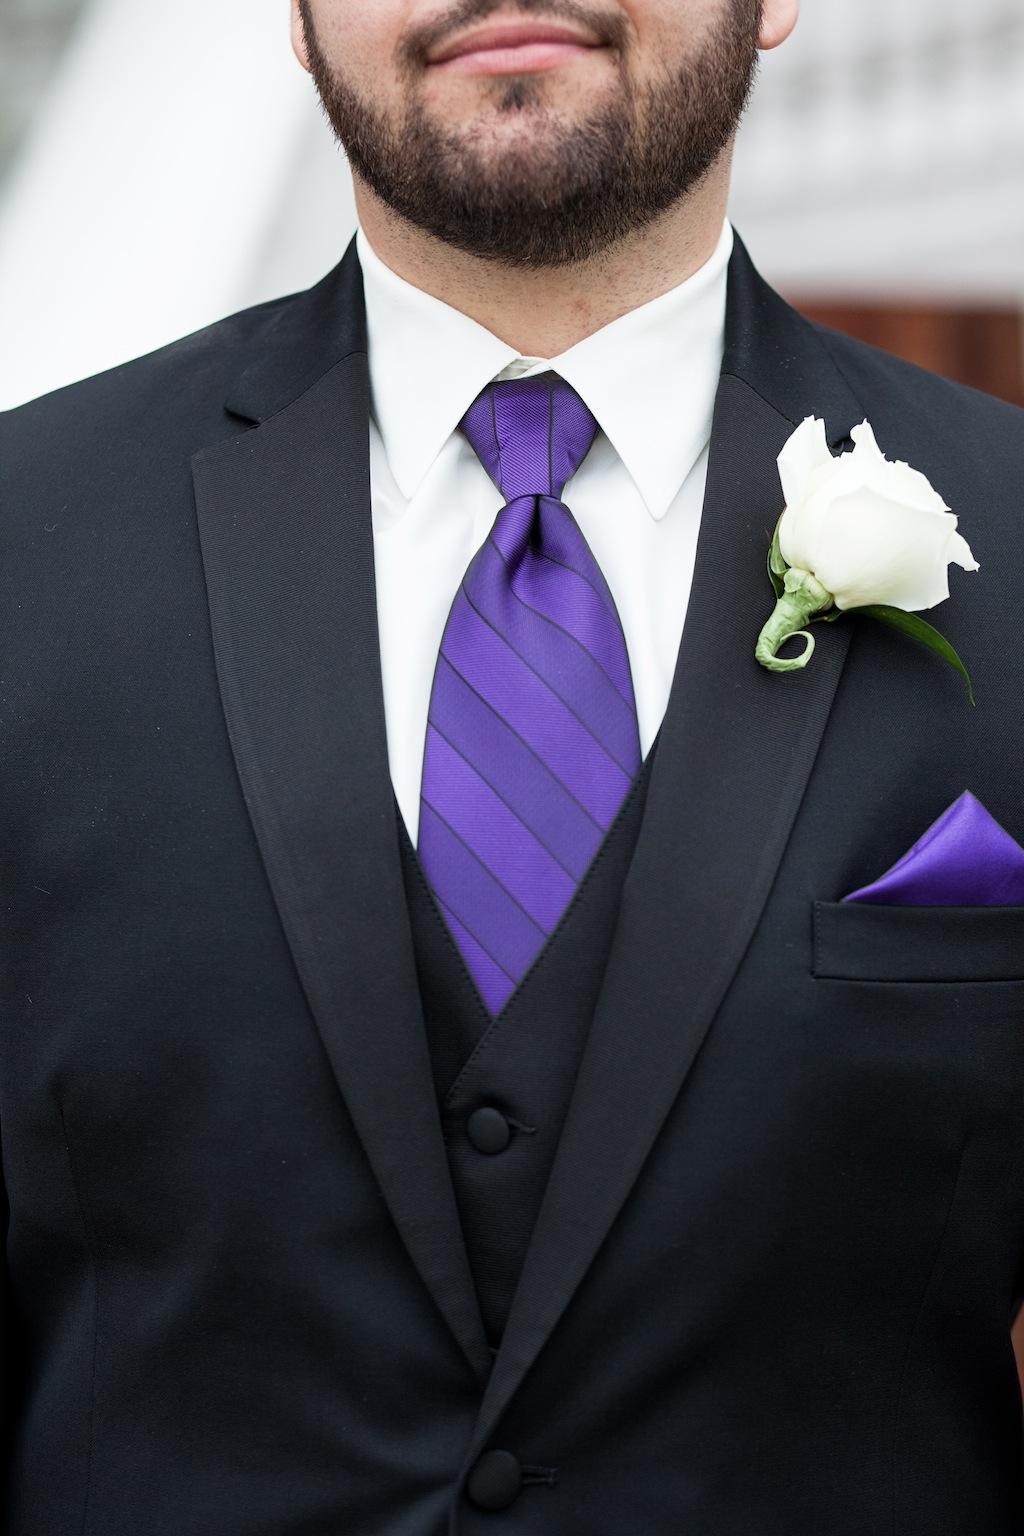 Brooksville Wedding - Purple, Silver & Ivory Wedding at Southern Hills Plantation Club - Brooksville Wedding Photographer Blue Lane Studios (29)